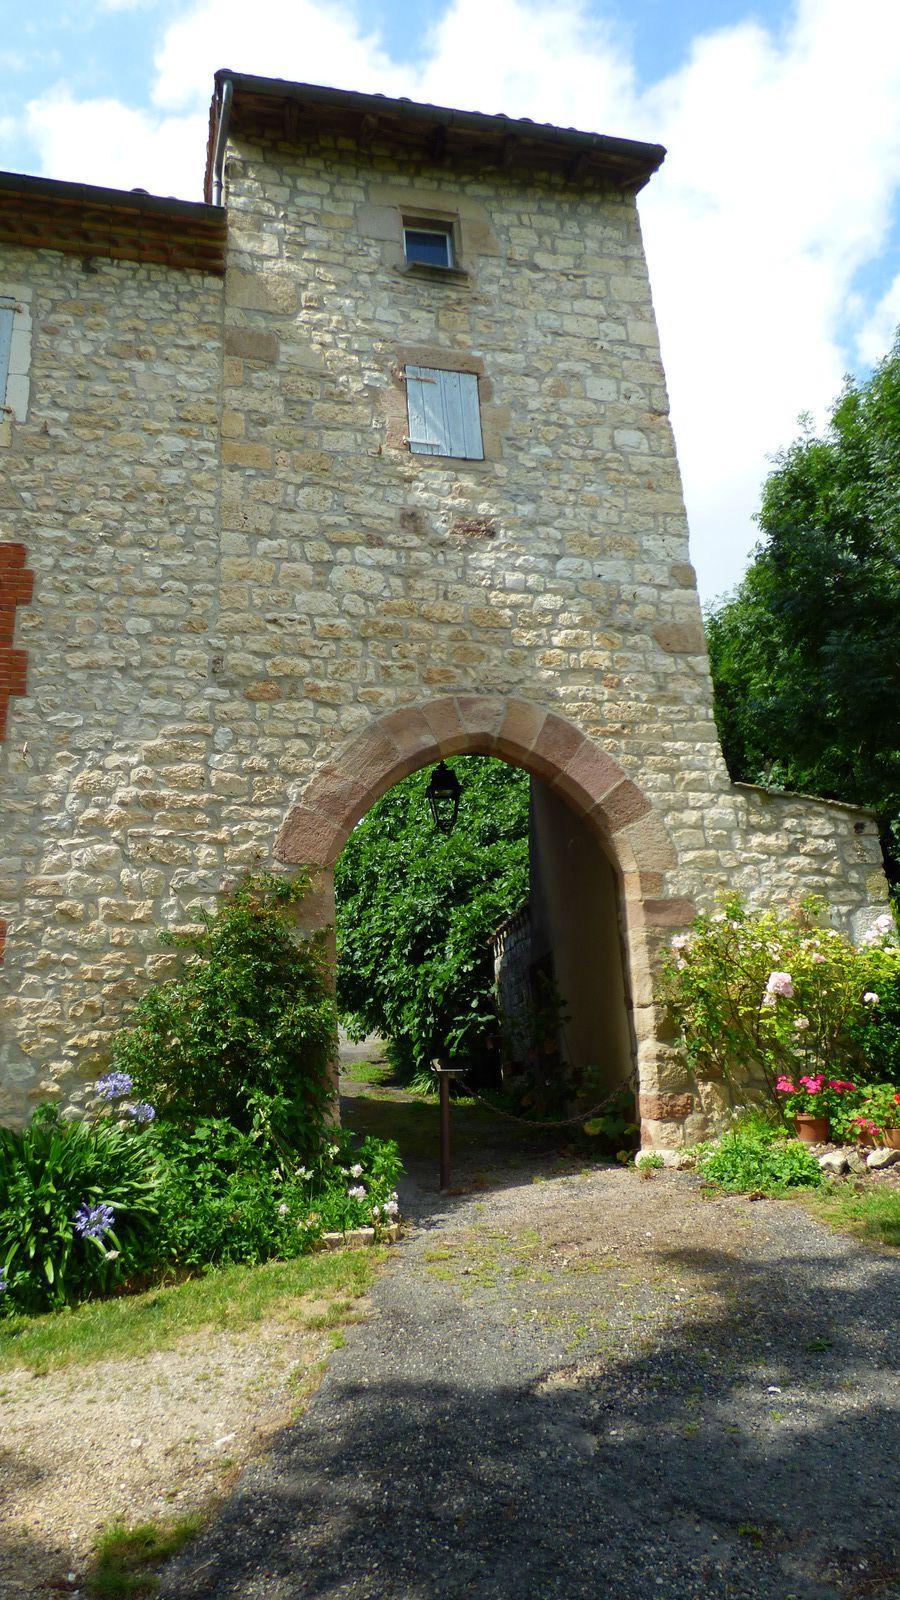 Itzac village du Tarn.